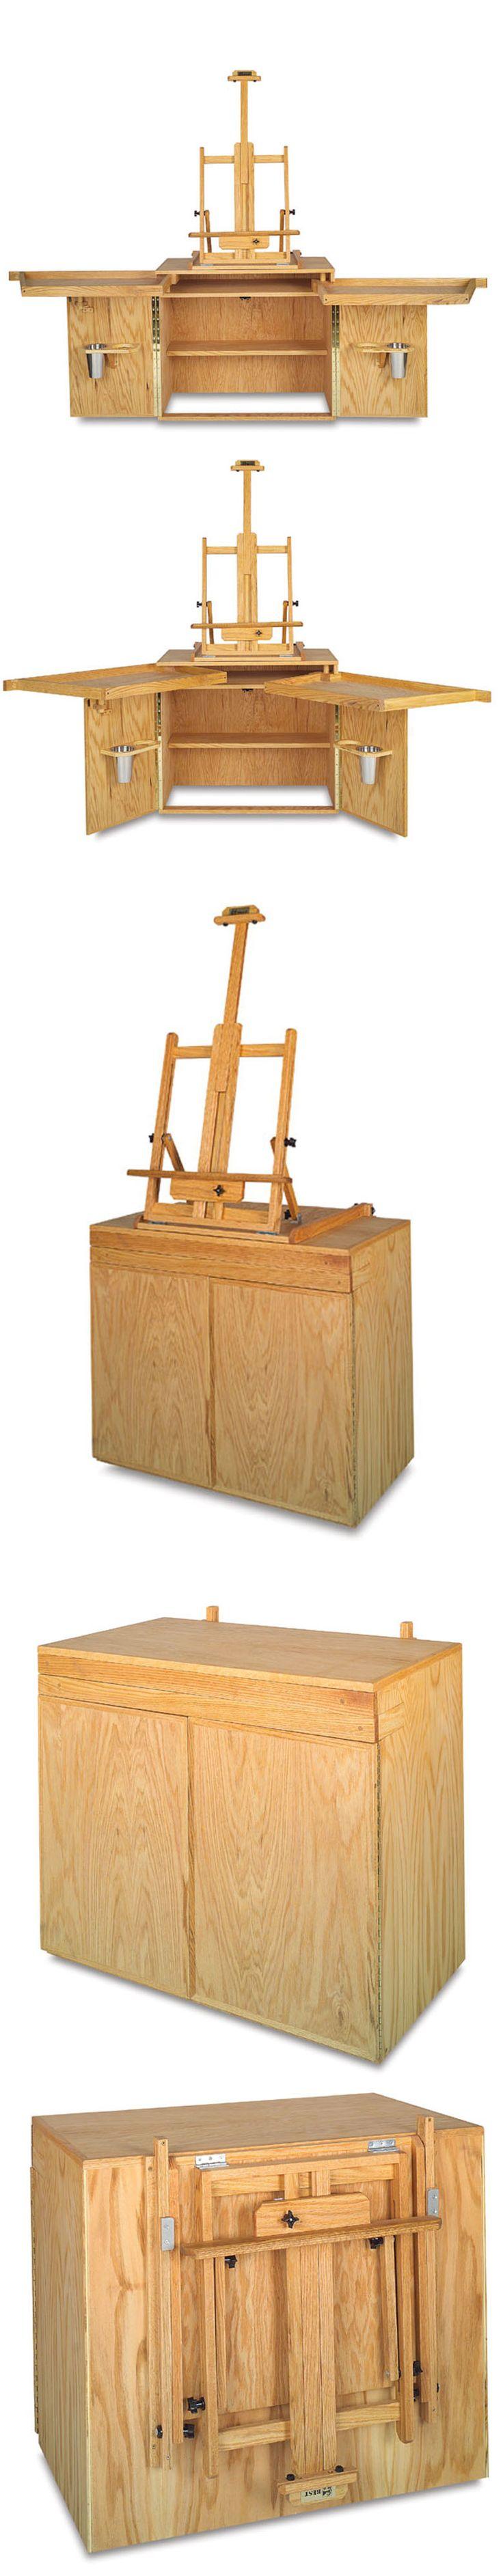 Best Urania's Pastel Desk      http://www.dickblick.com/products/best-uranias-pastel-desk/#description